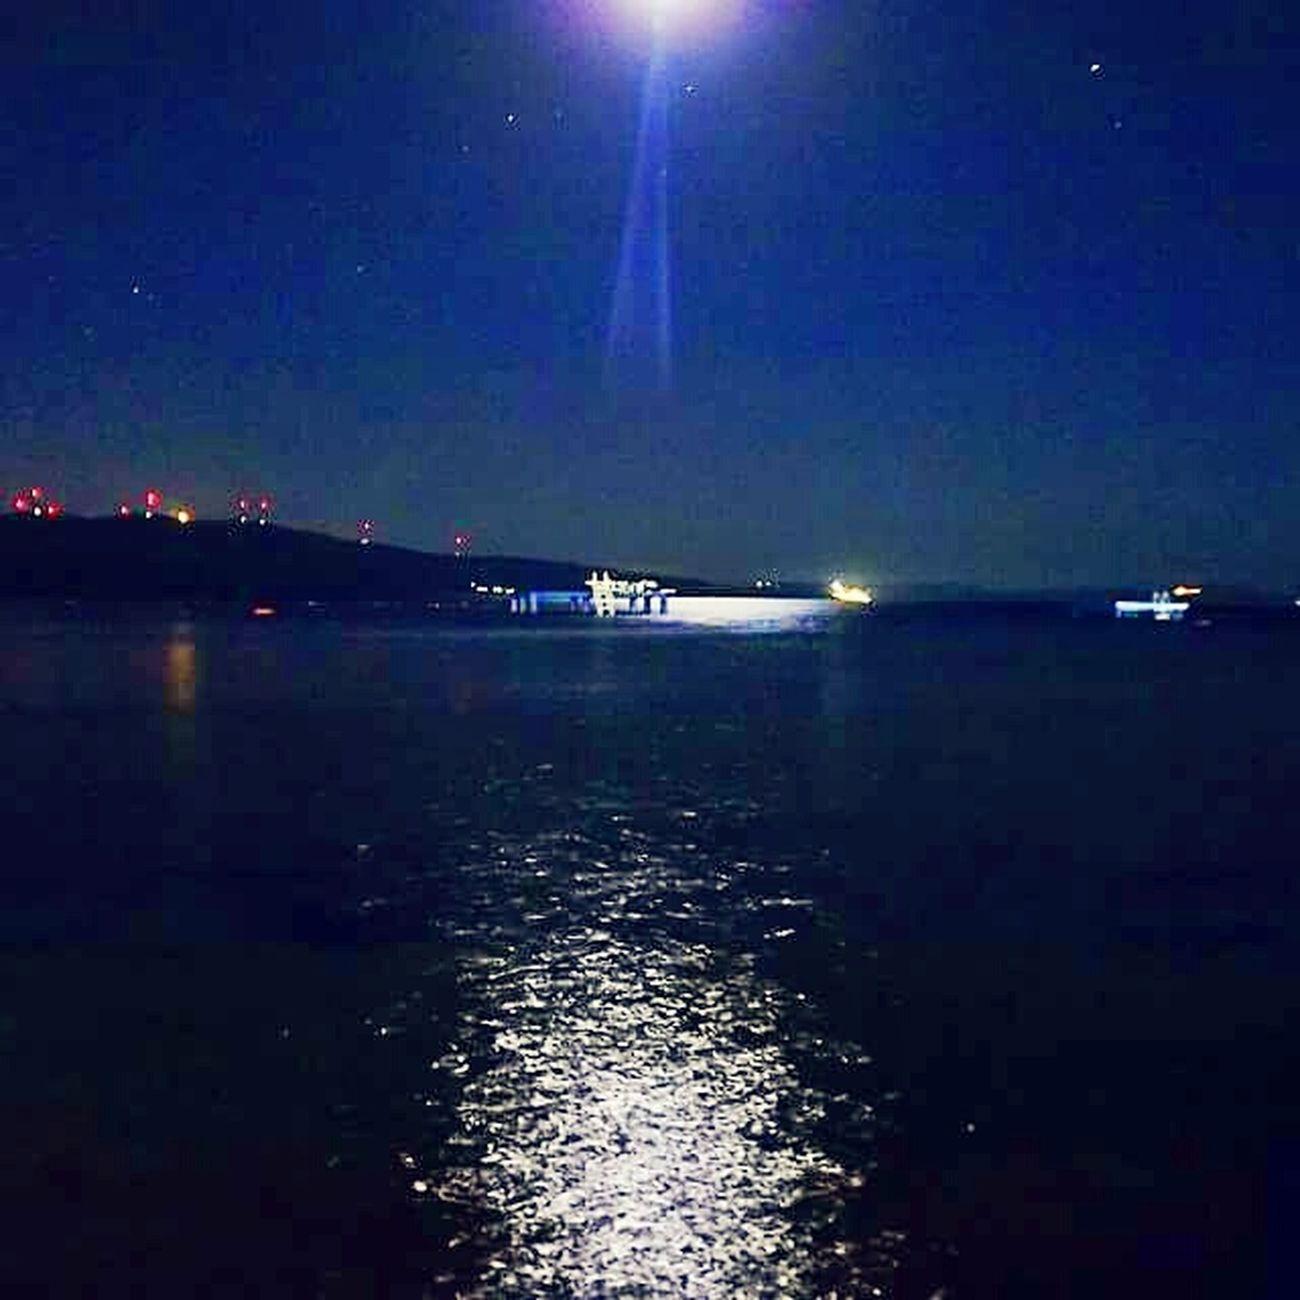 Phosphorescence Yakamoz Moonlight Night Gece Night Photography Sea And Sky Sky Sea Travel Photography Reflection Water Reflection Water Reflections Night Lights EyeEm Best Shots Waves